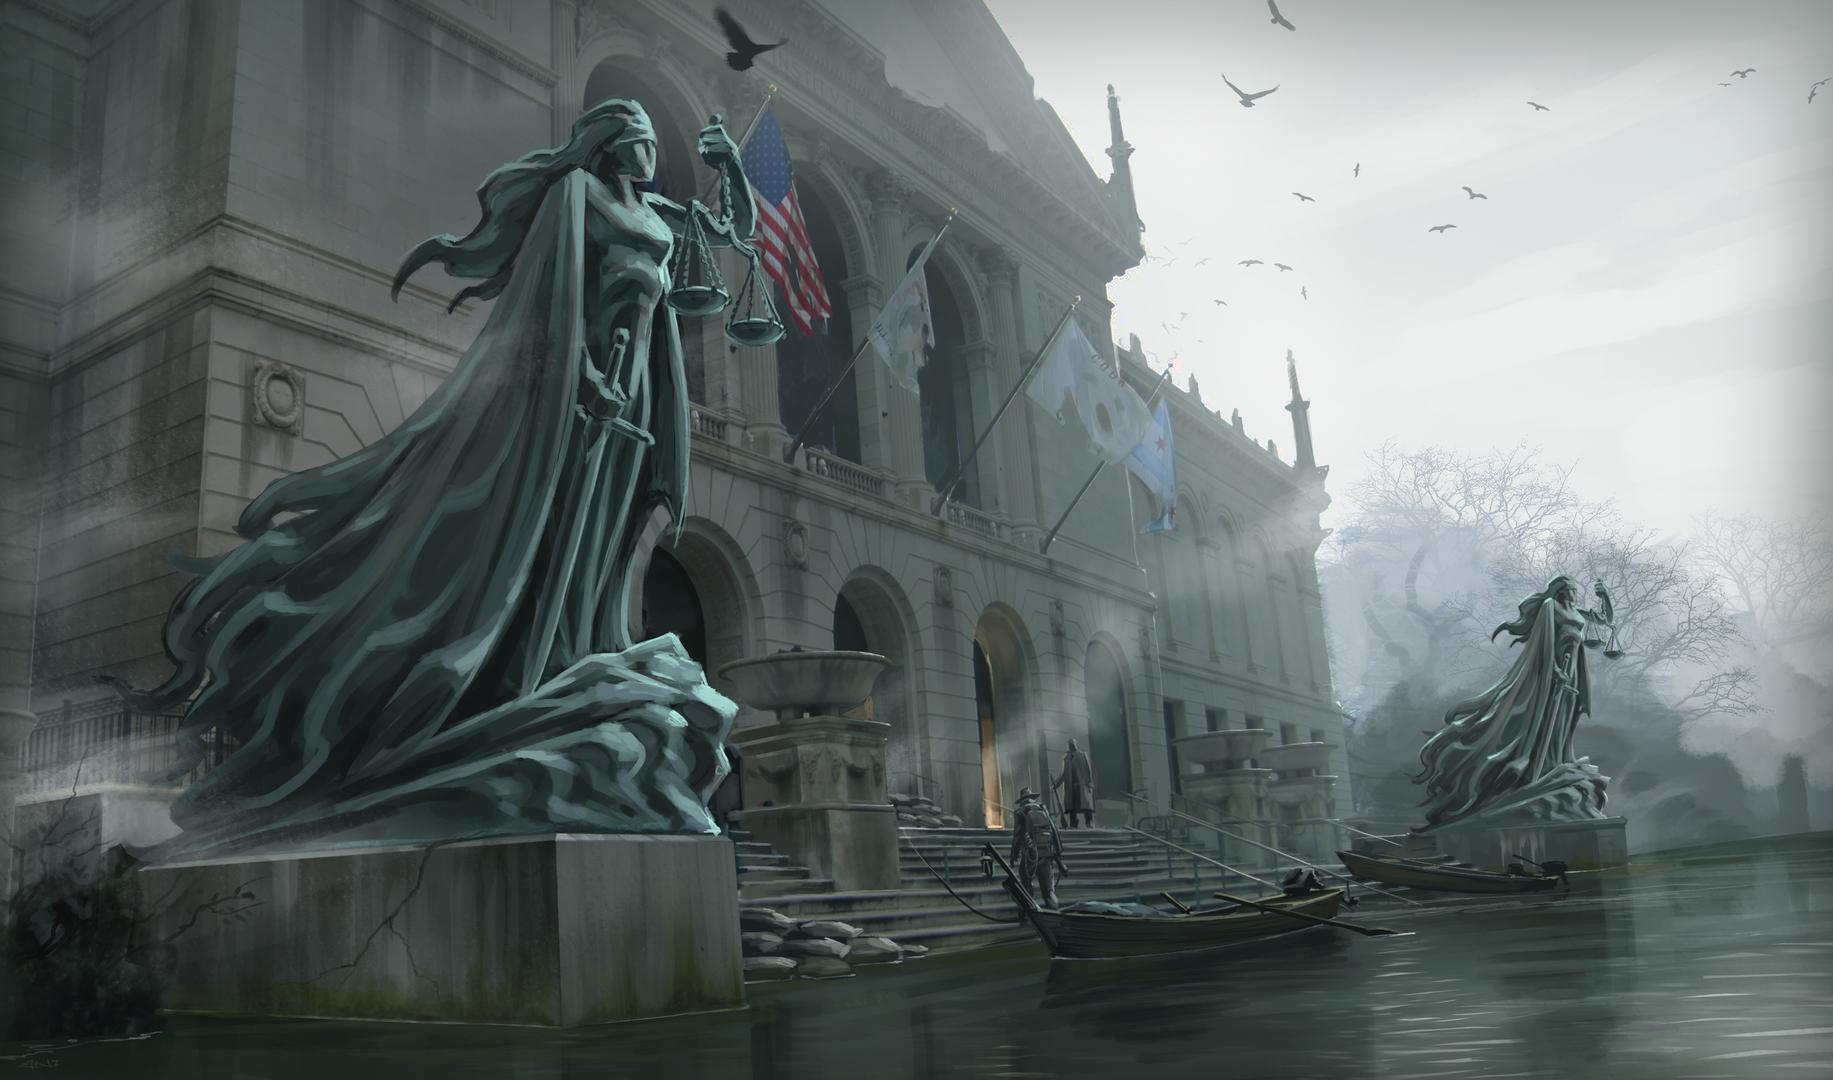 Lovecraftian_greeble_1